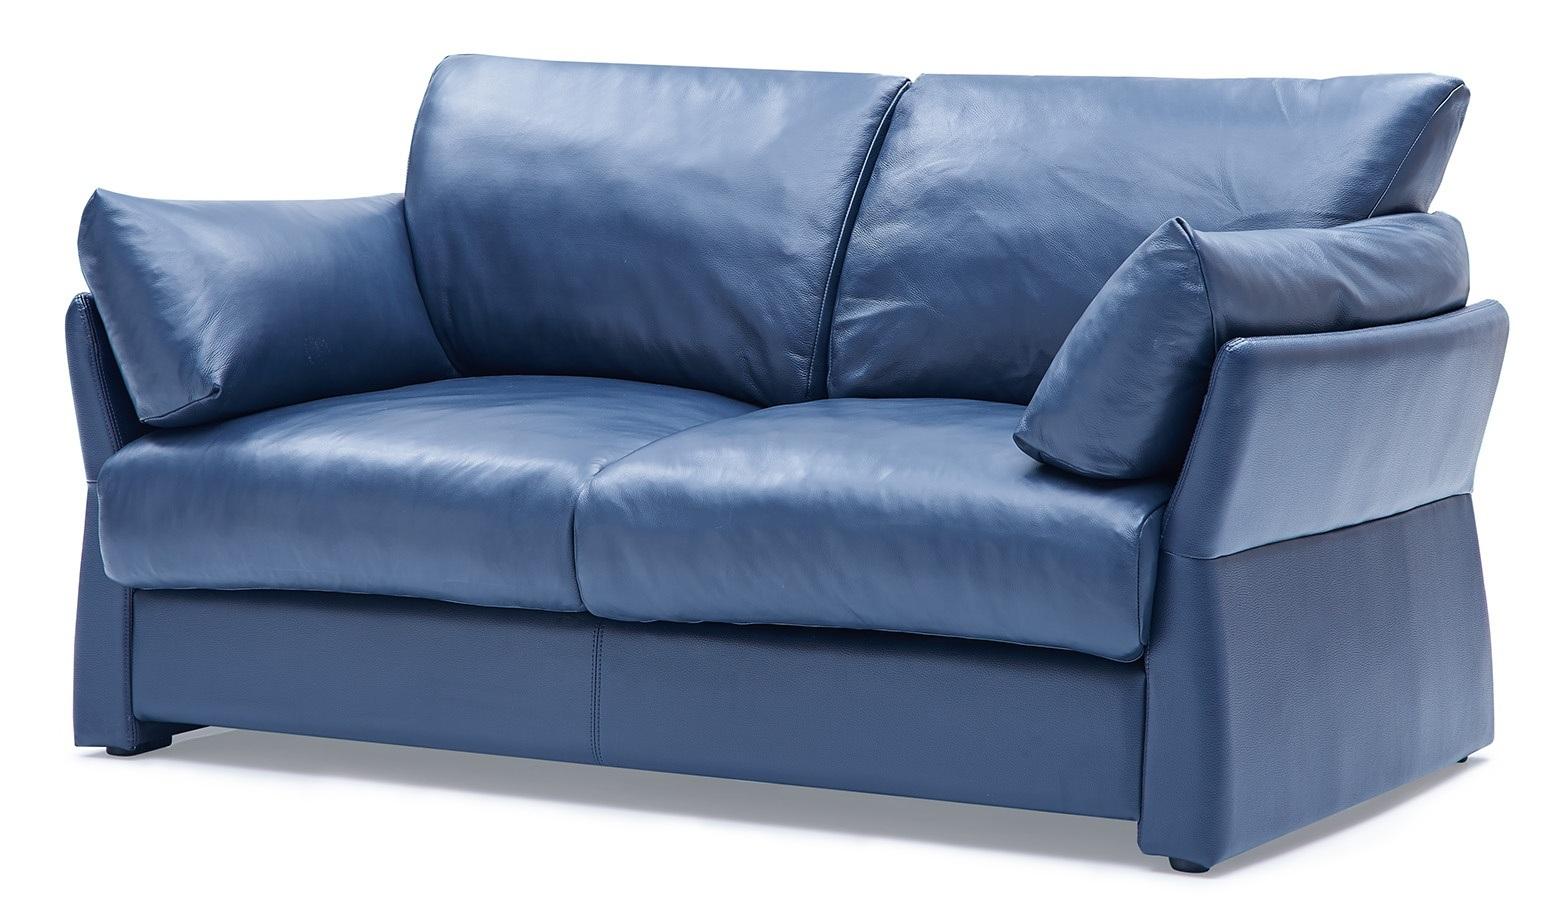 China Leather Sofa Clic French Style